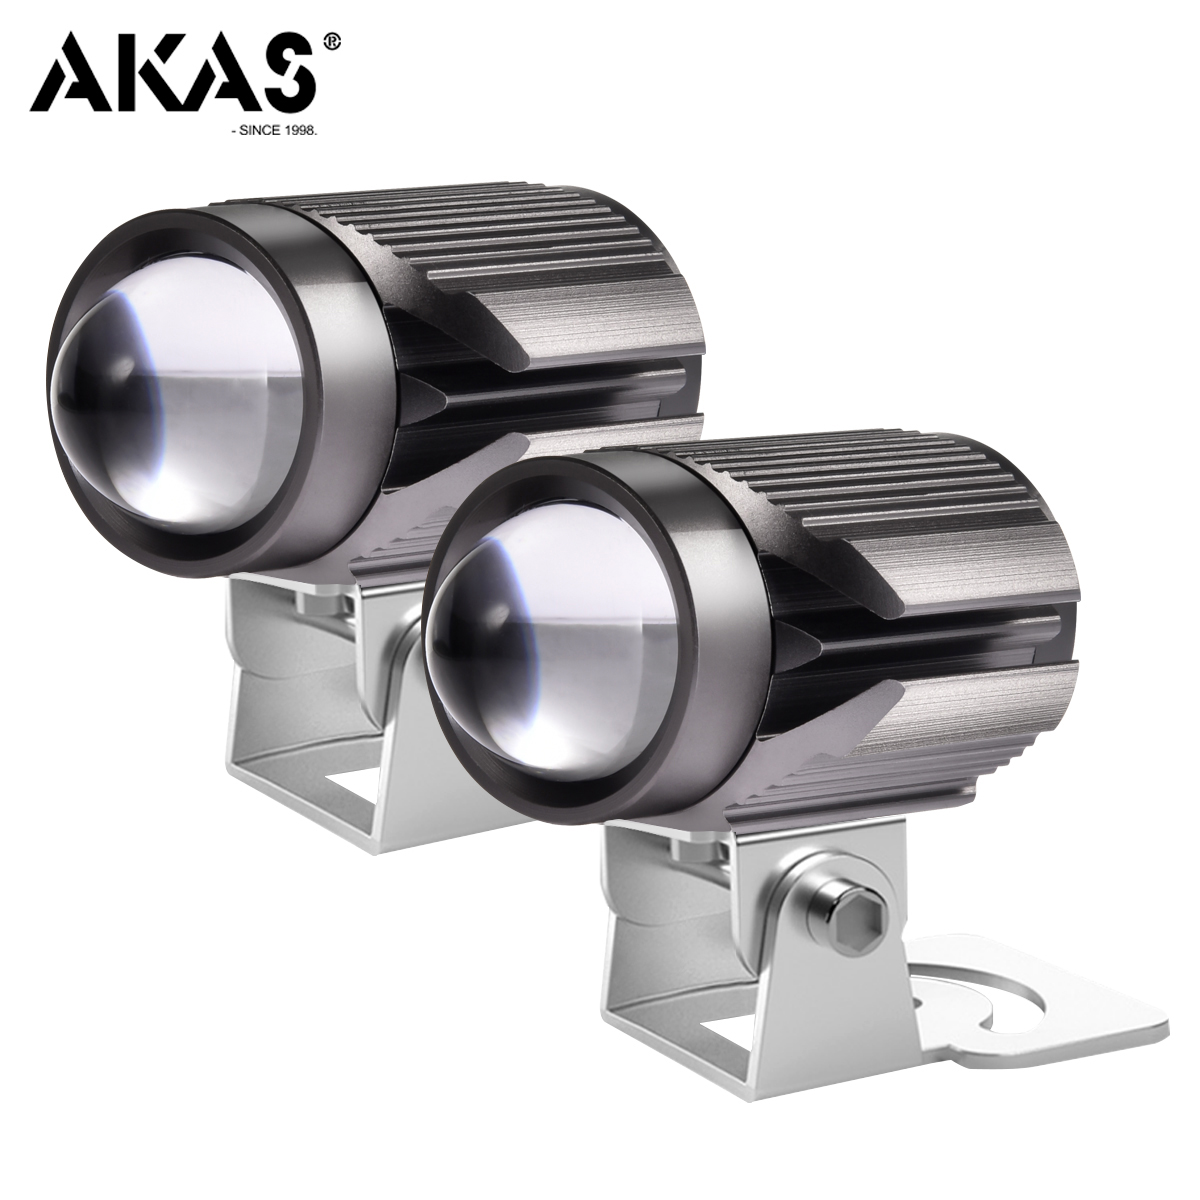 AKAS 16W Super Bright Tri-model Motorcycle LED Headlight 9-85V 6000LM Driving Spot Head Lamp Fog Light